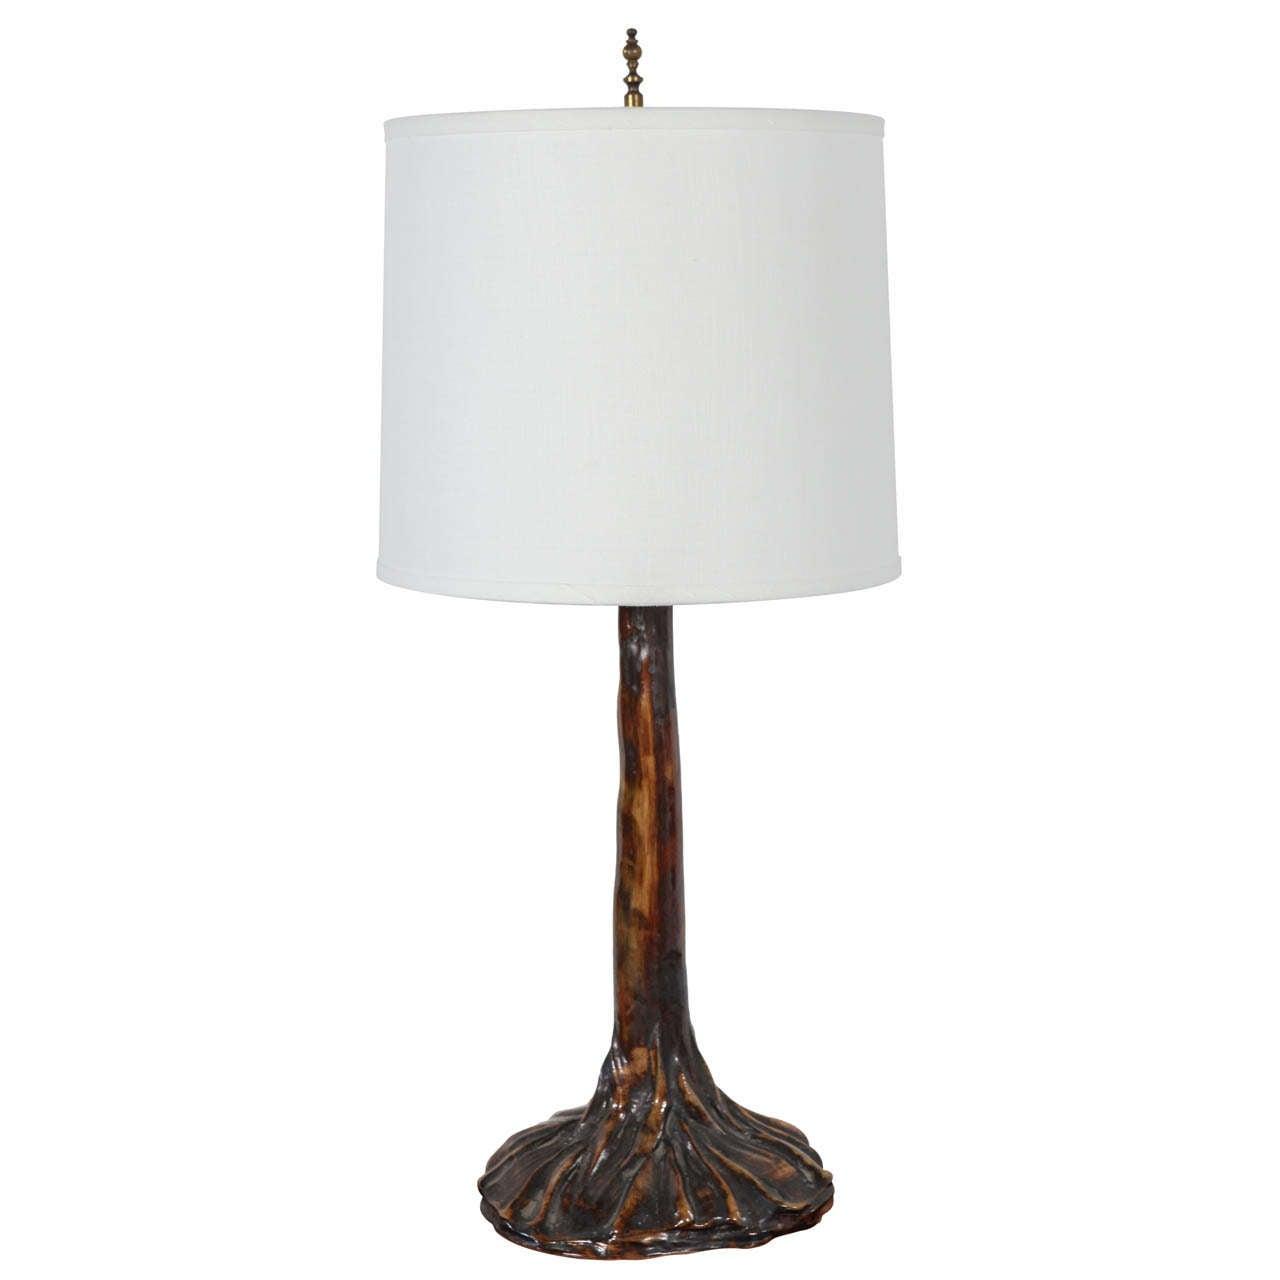 polished ceramic tree trunk table lamp at 1stdibs. Black Bedroom Furniture Sets. Home Design Ideas